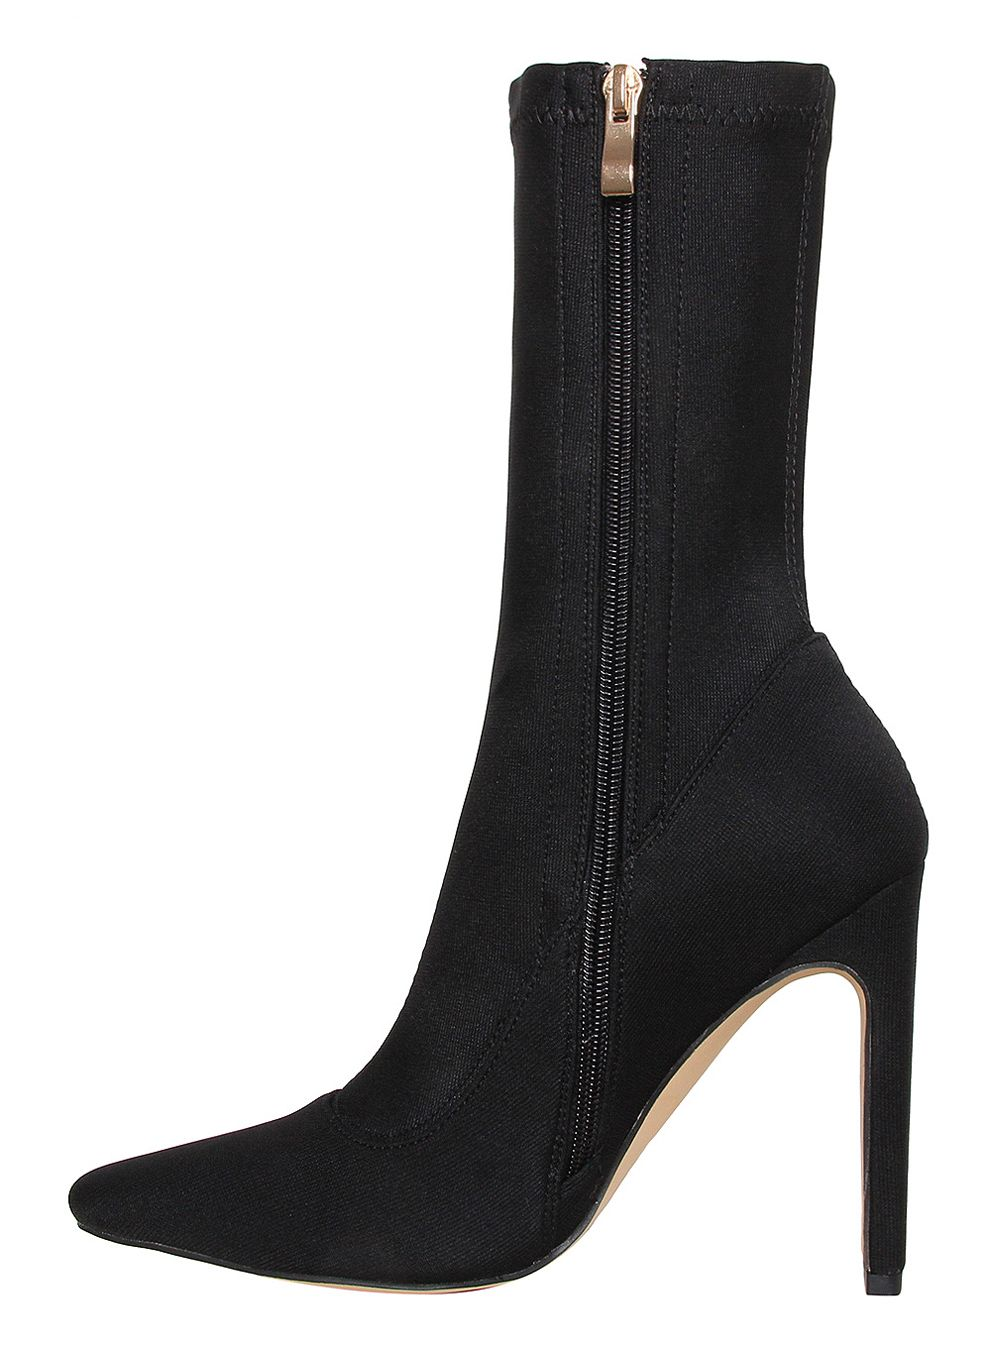 slim heel ankle boots